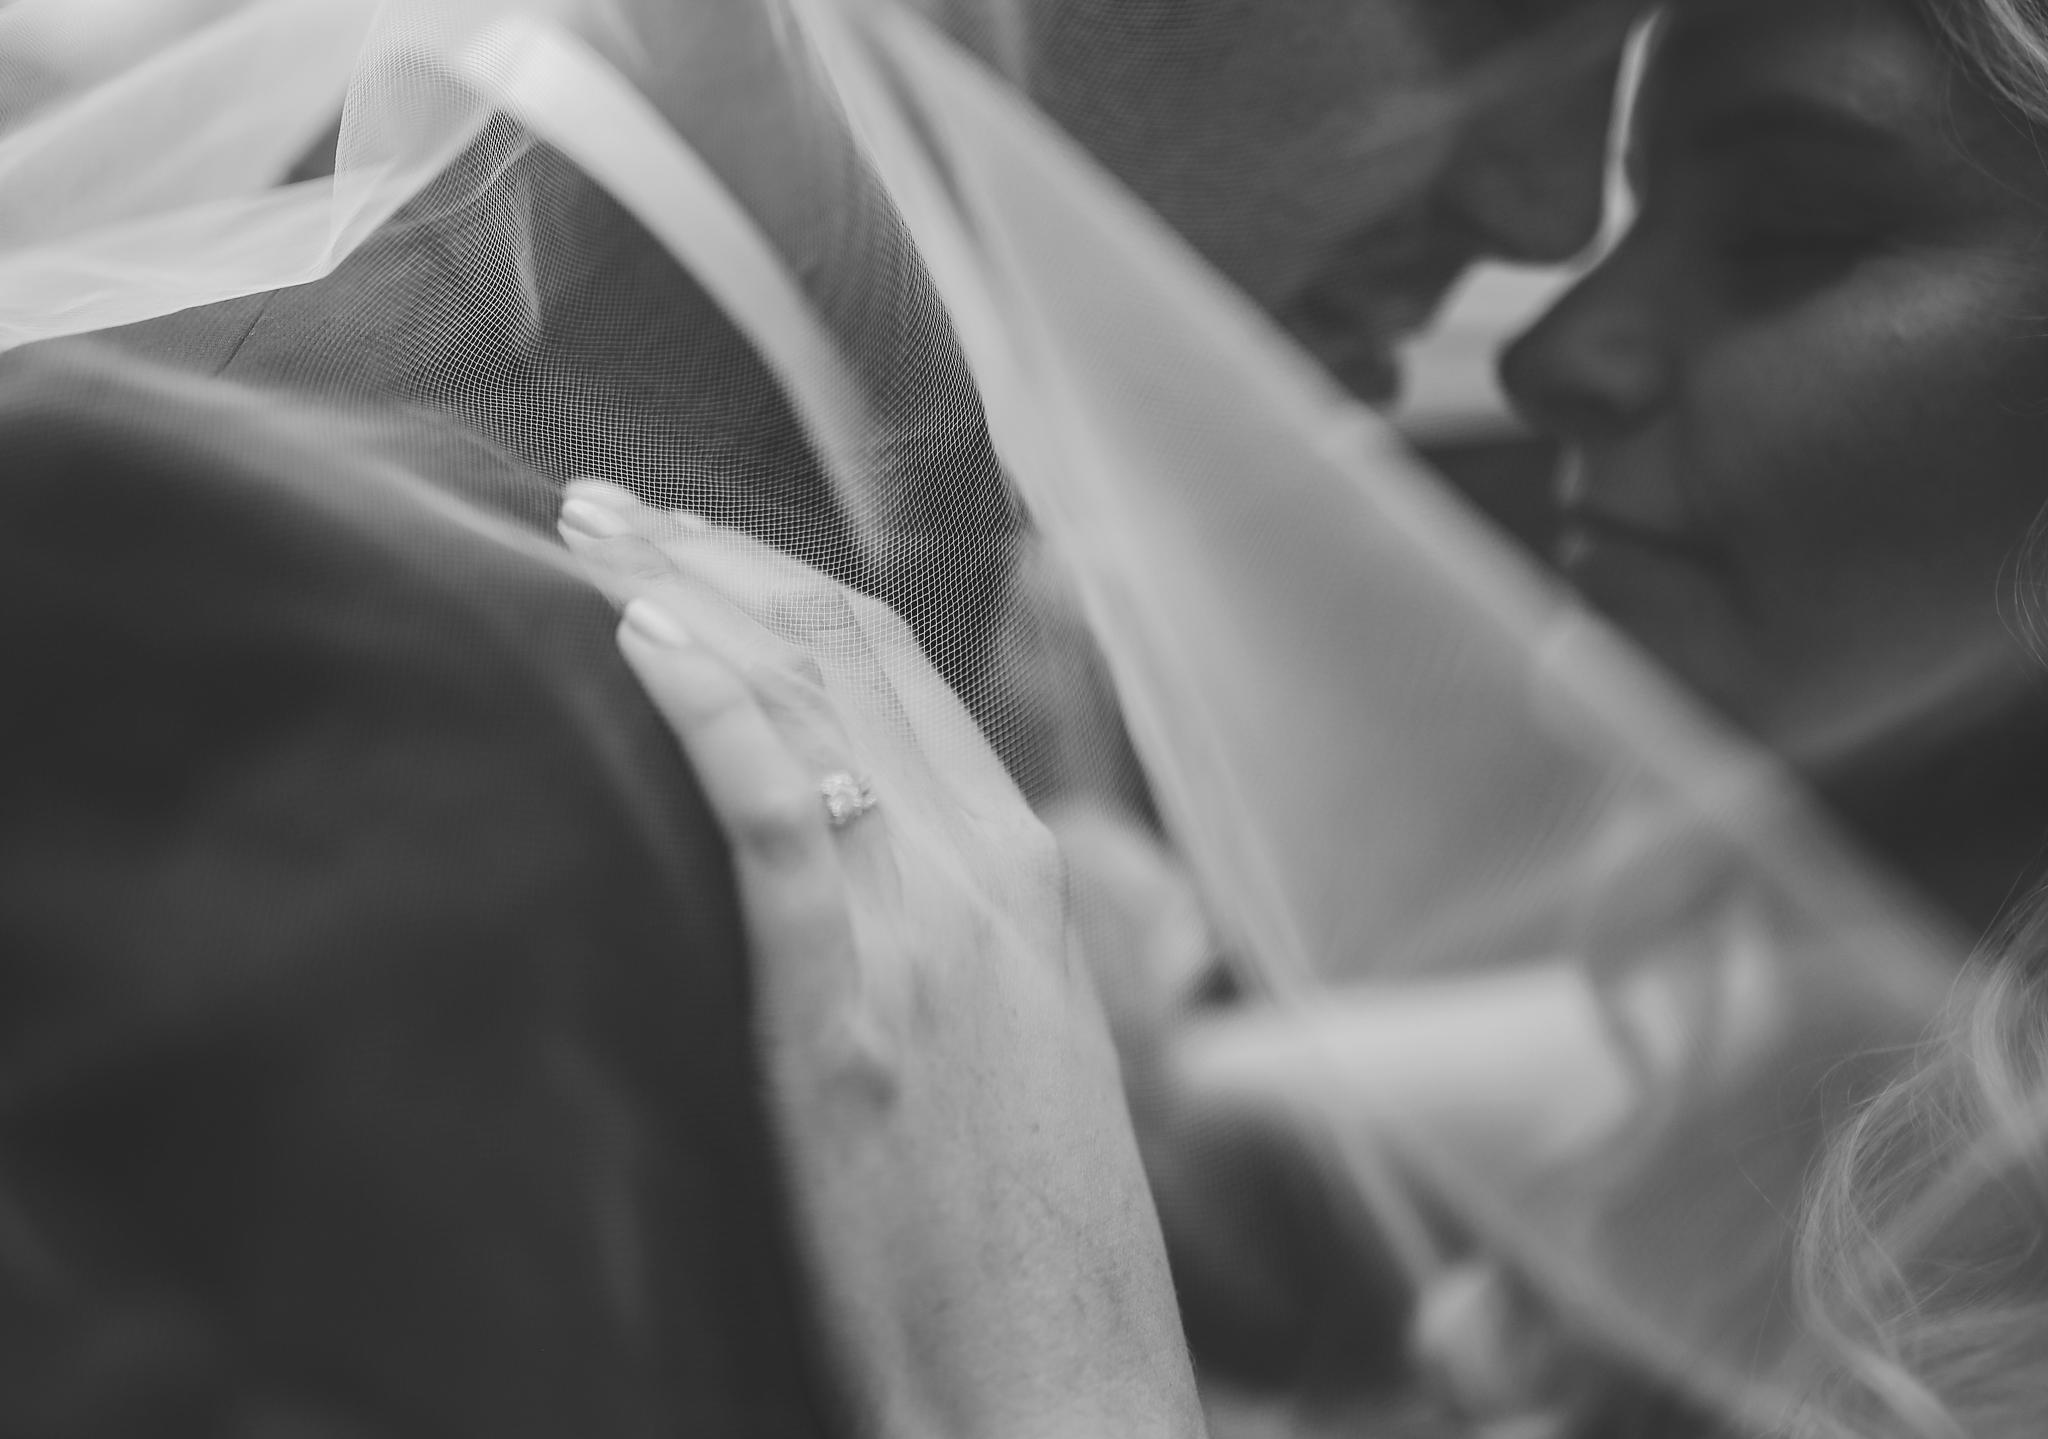 IMG_6088-2-VANCOUVER-WEDDING-PHOTOGRAPHER-JENNIFER-PICARD-PHOTOGRAPHY.jpg